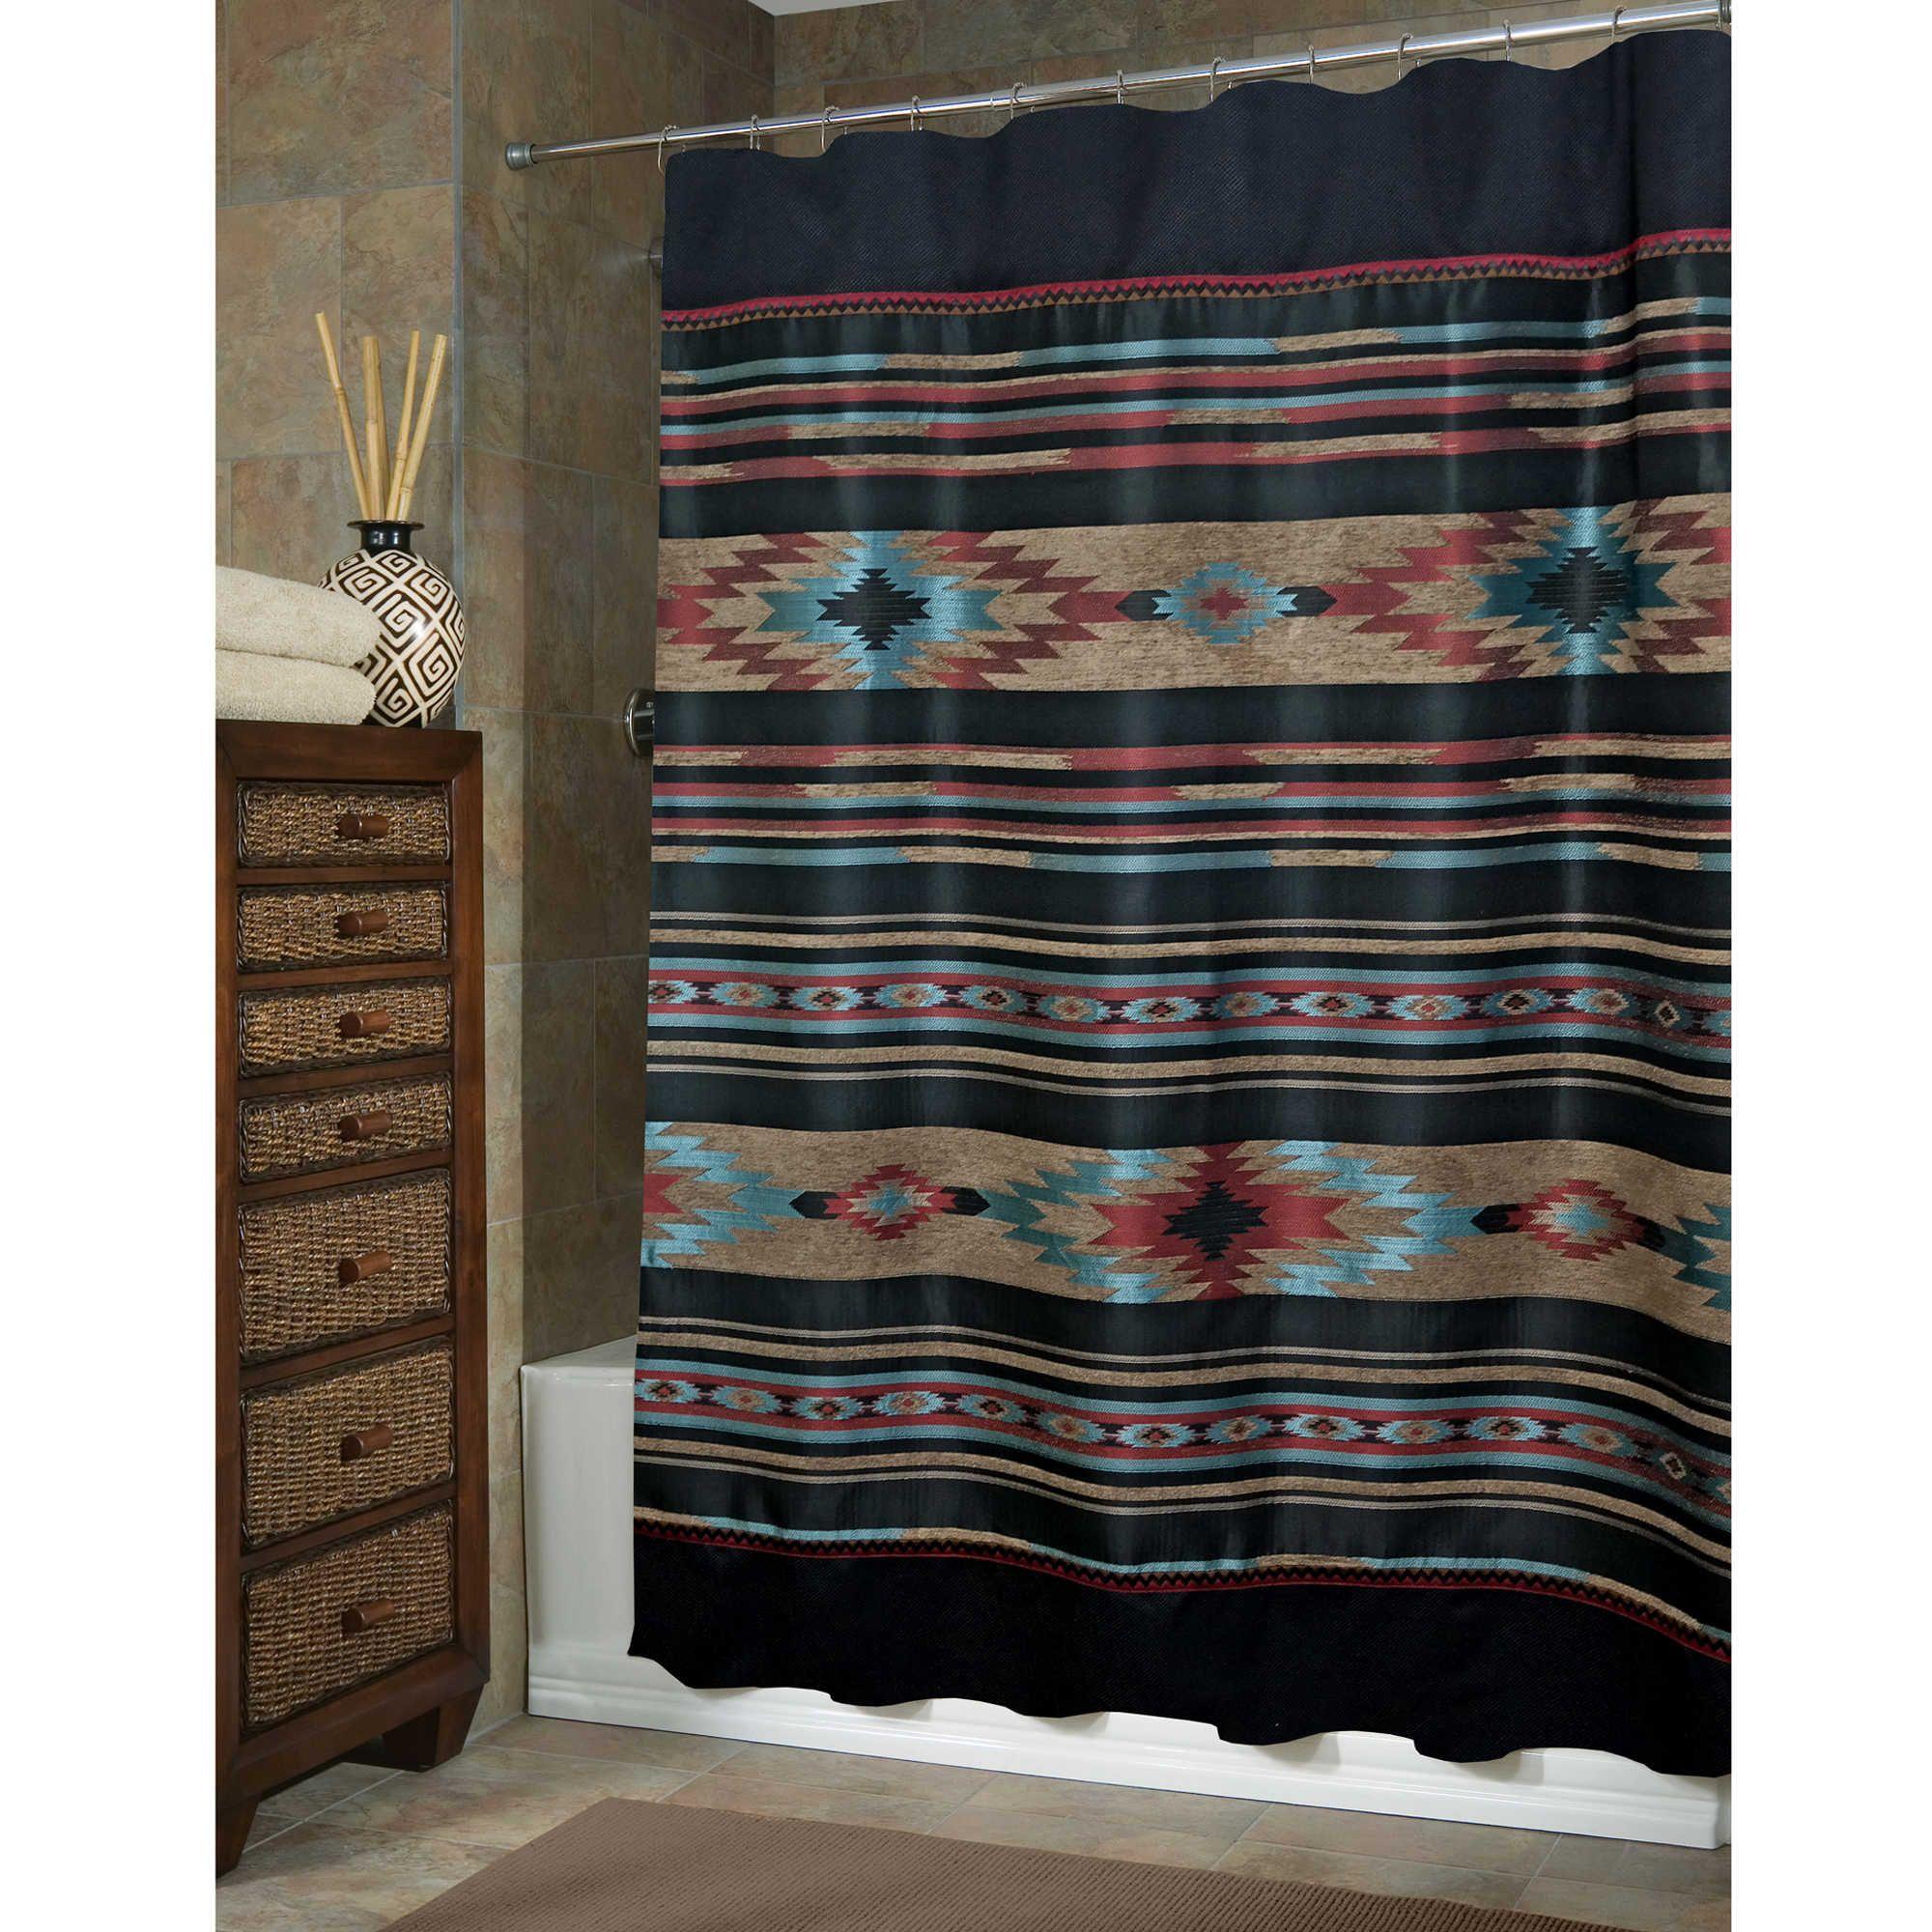 Invalid Url Southwestern Shower Curtains Southwest Shower